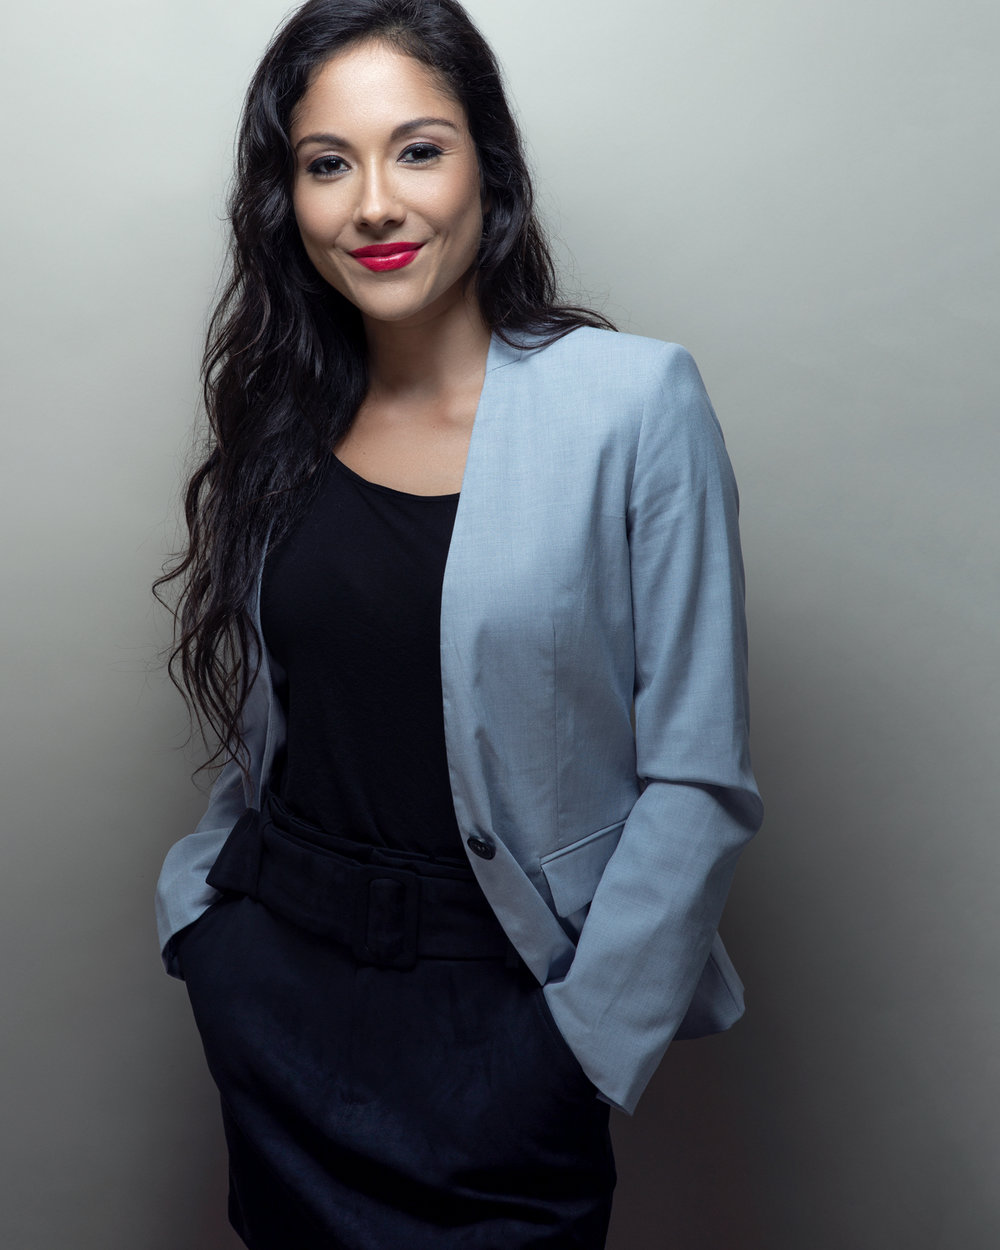 Juliet Clemens Honolulu Real Estate Agent - Photograph: Mike Vidales